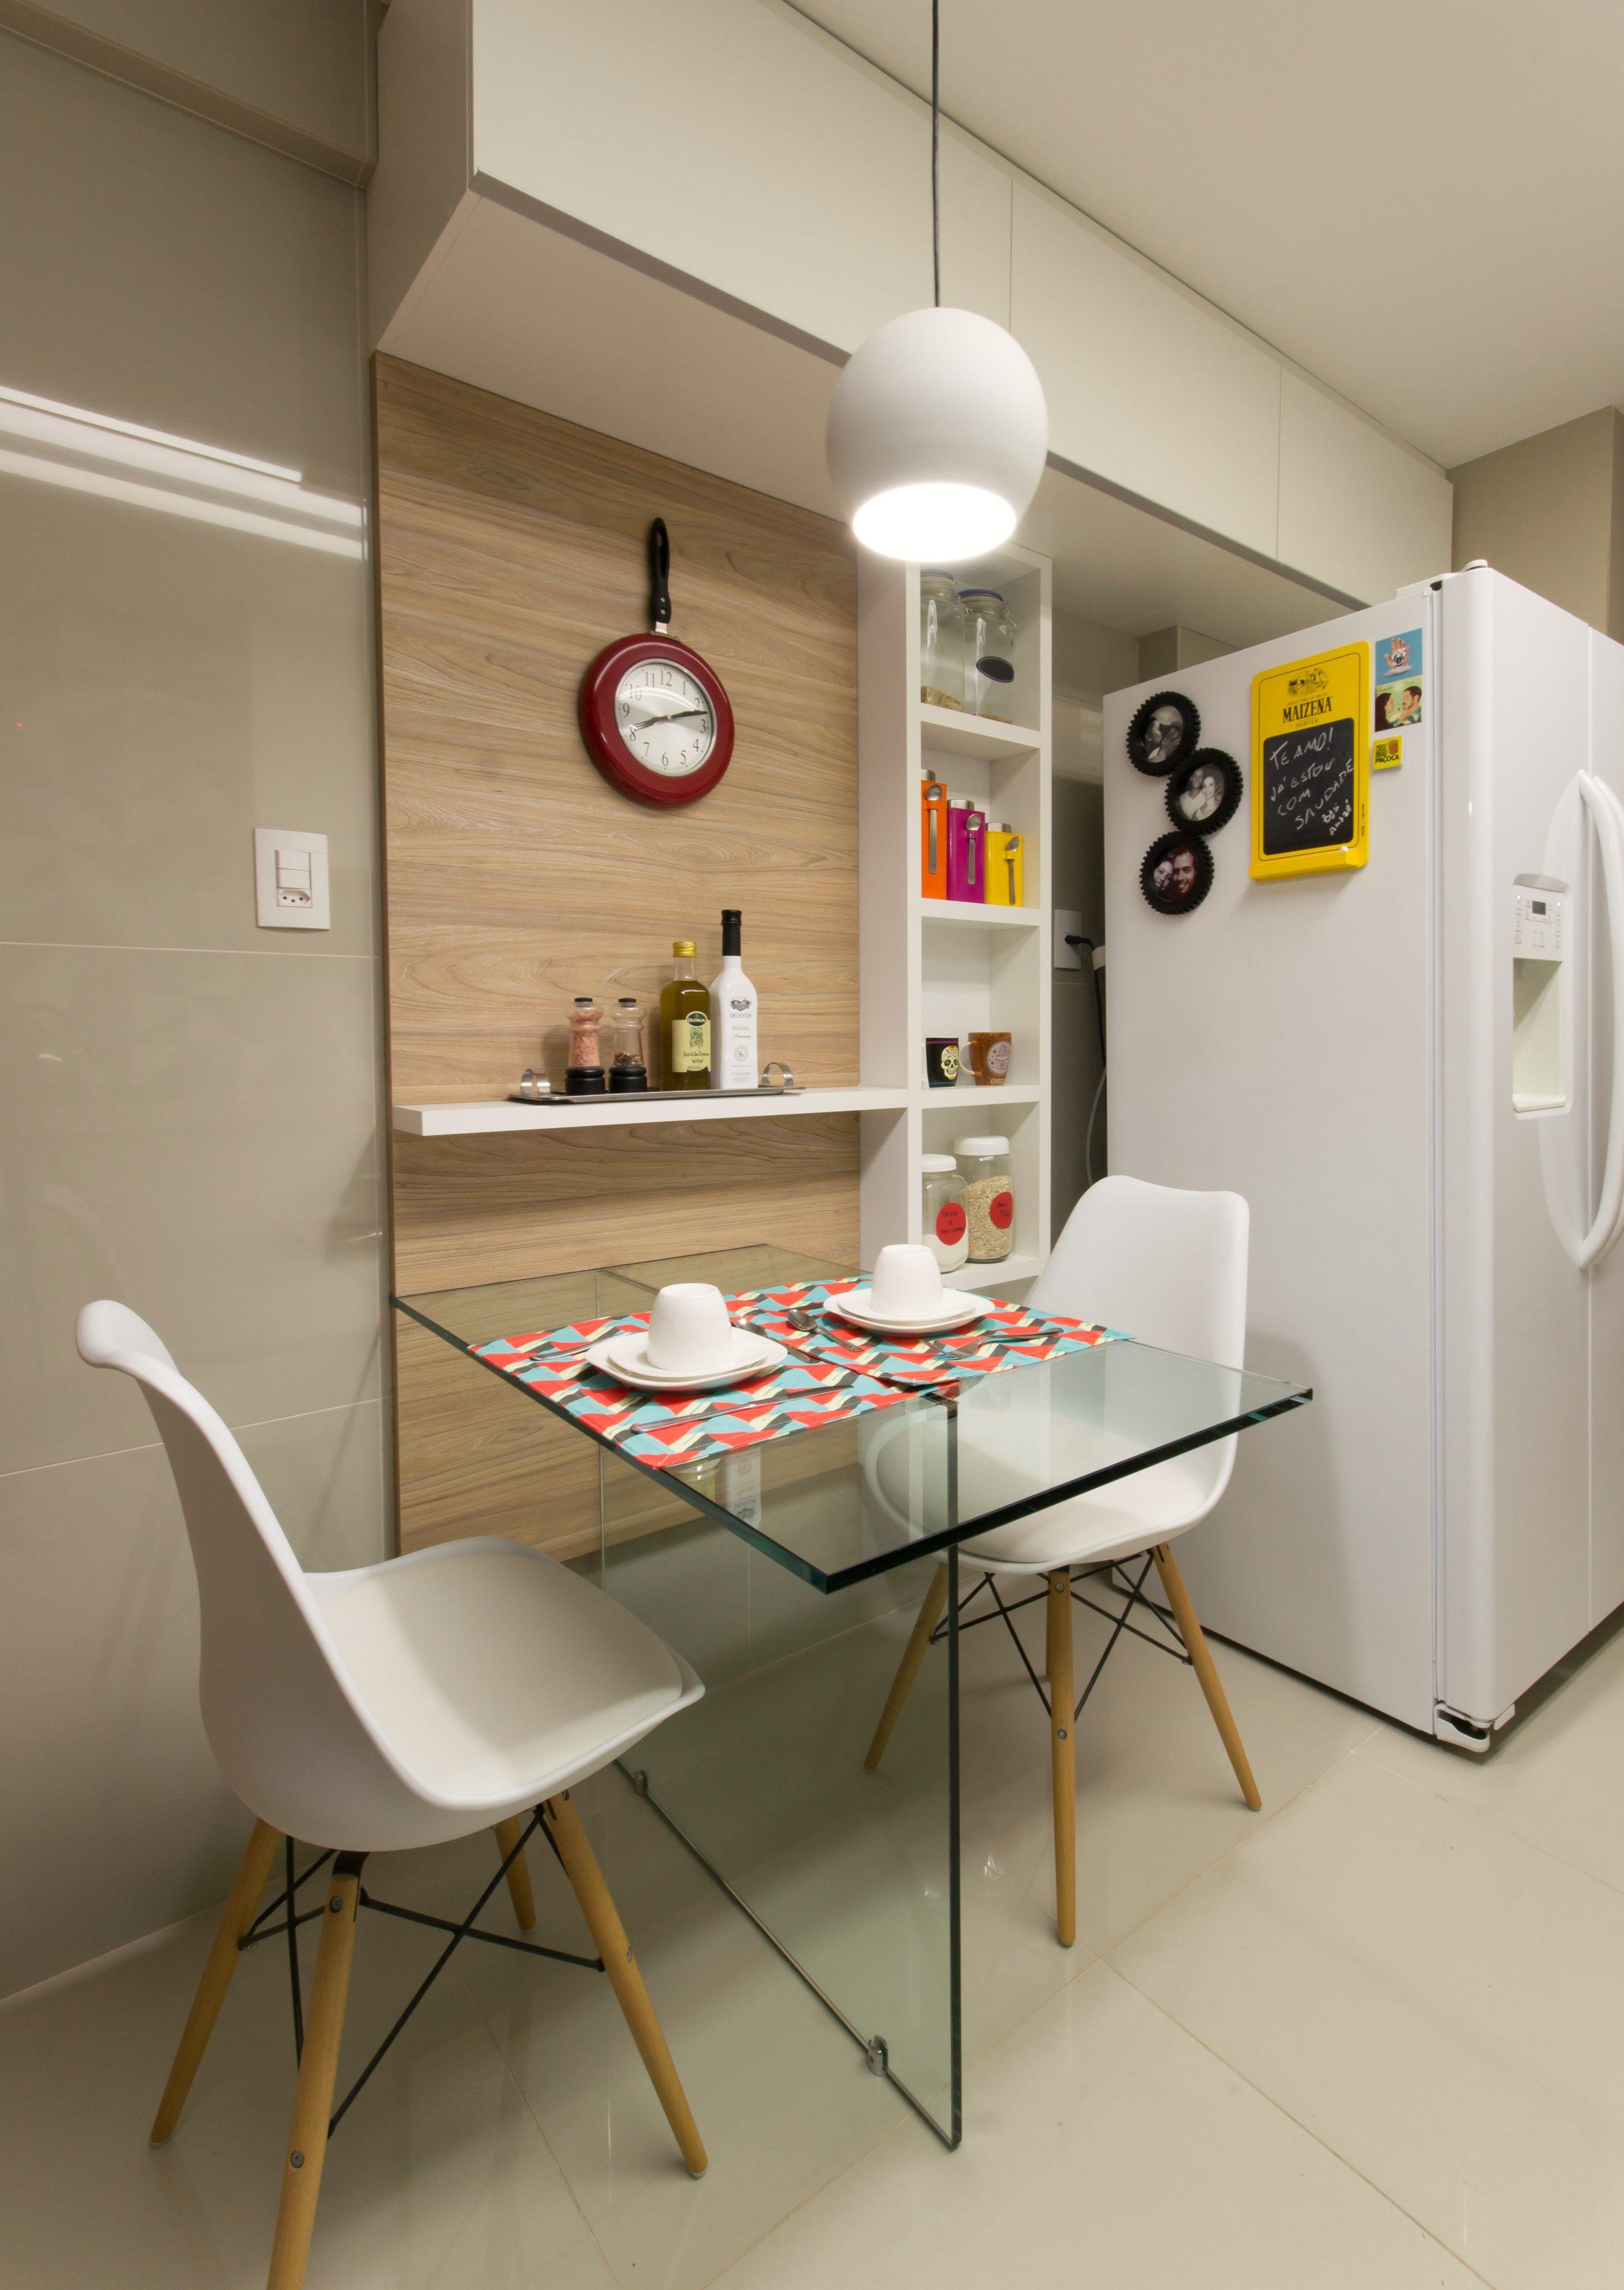 Cozinha Projeto Unio Arquitetura Unioarquitetura Decora O